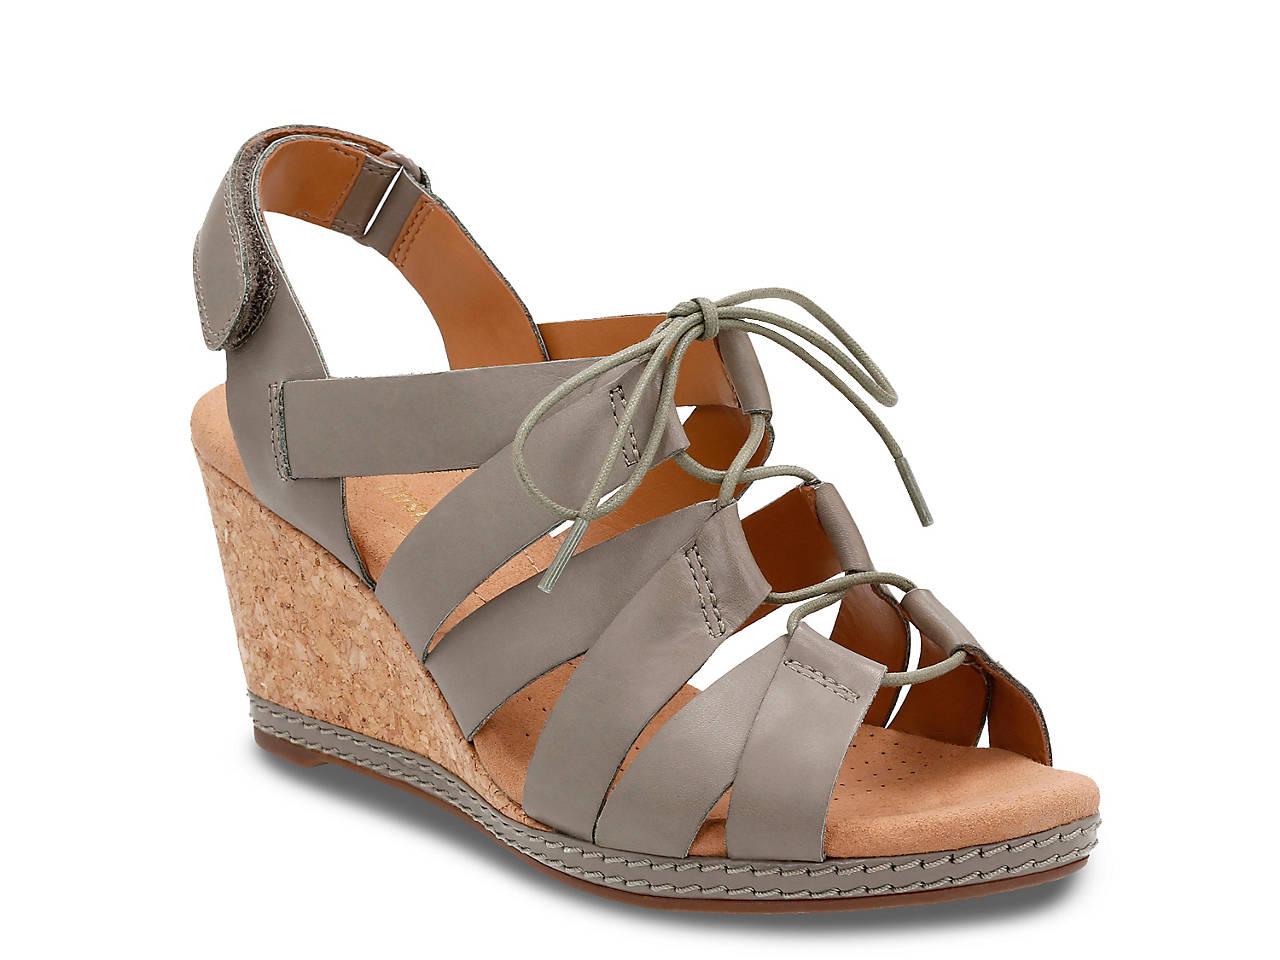 242183b771de0e Clarks Helio Mindin Wedge Sandal Women s Shoes